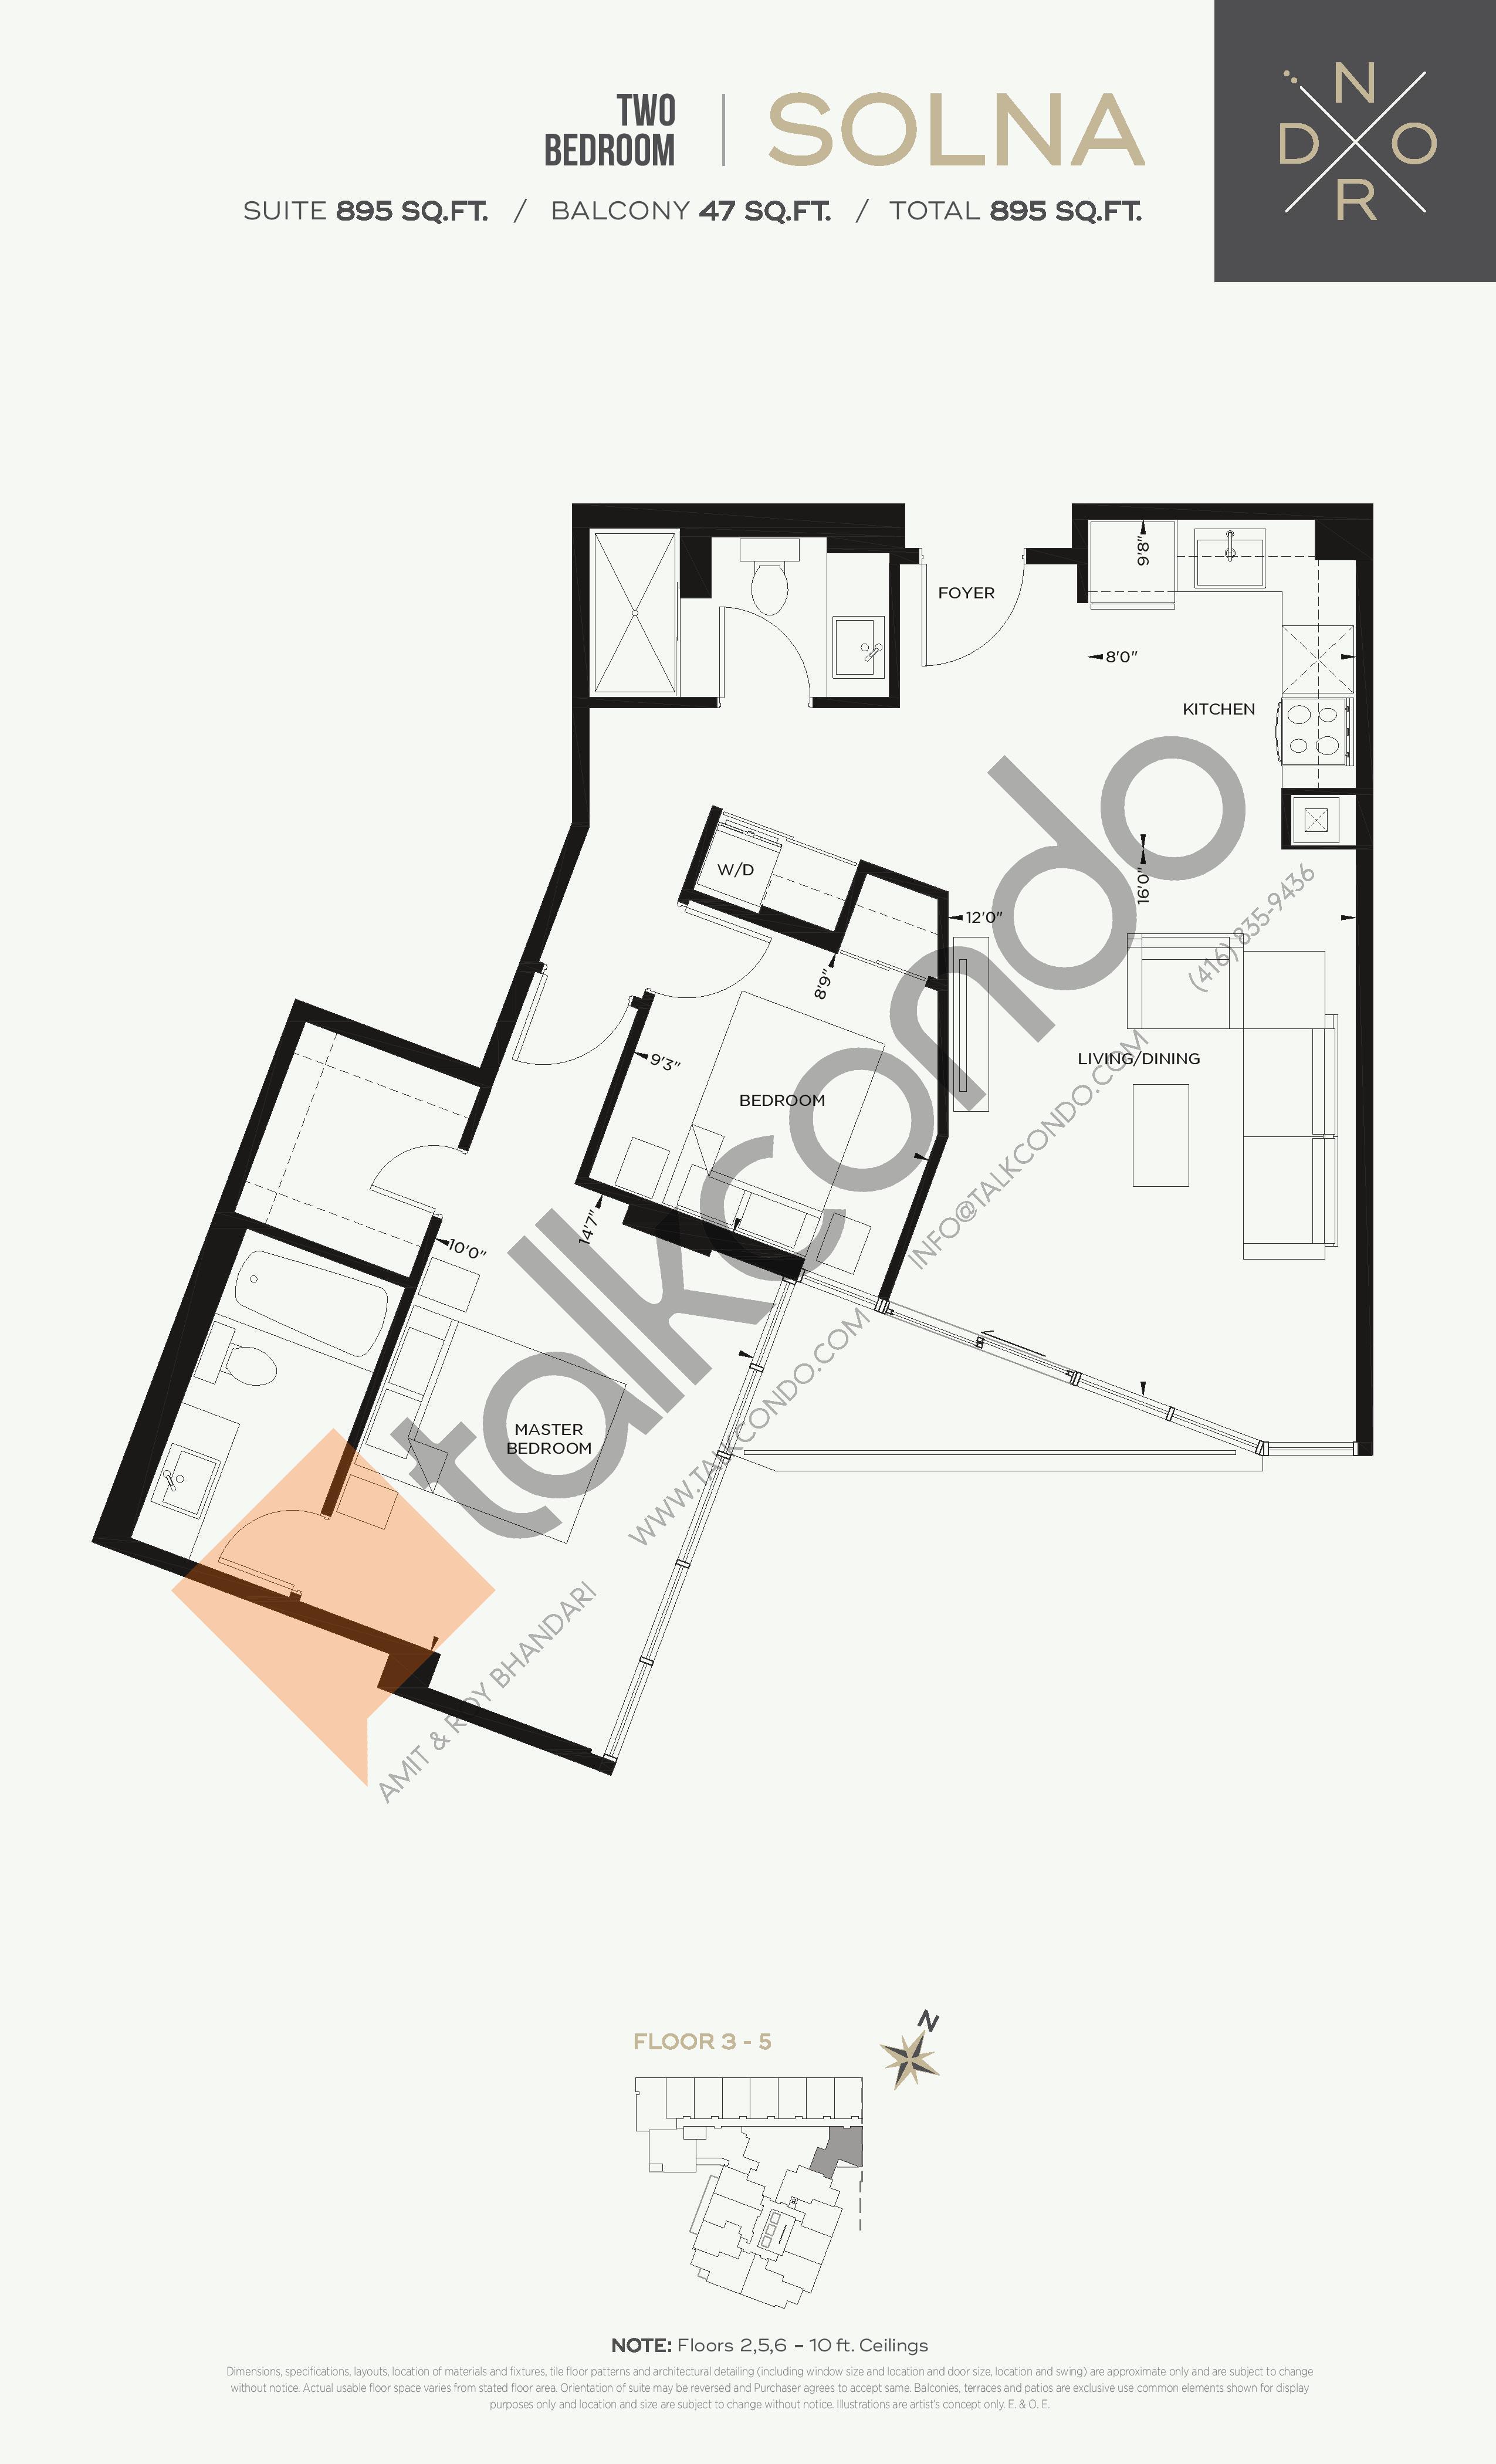 Solna Floor Plan at Nord West at Expo City Condos - 895 sq.ft